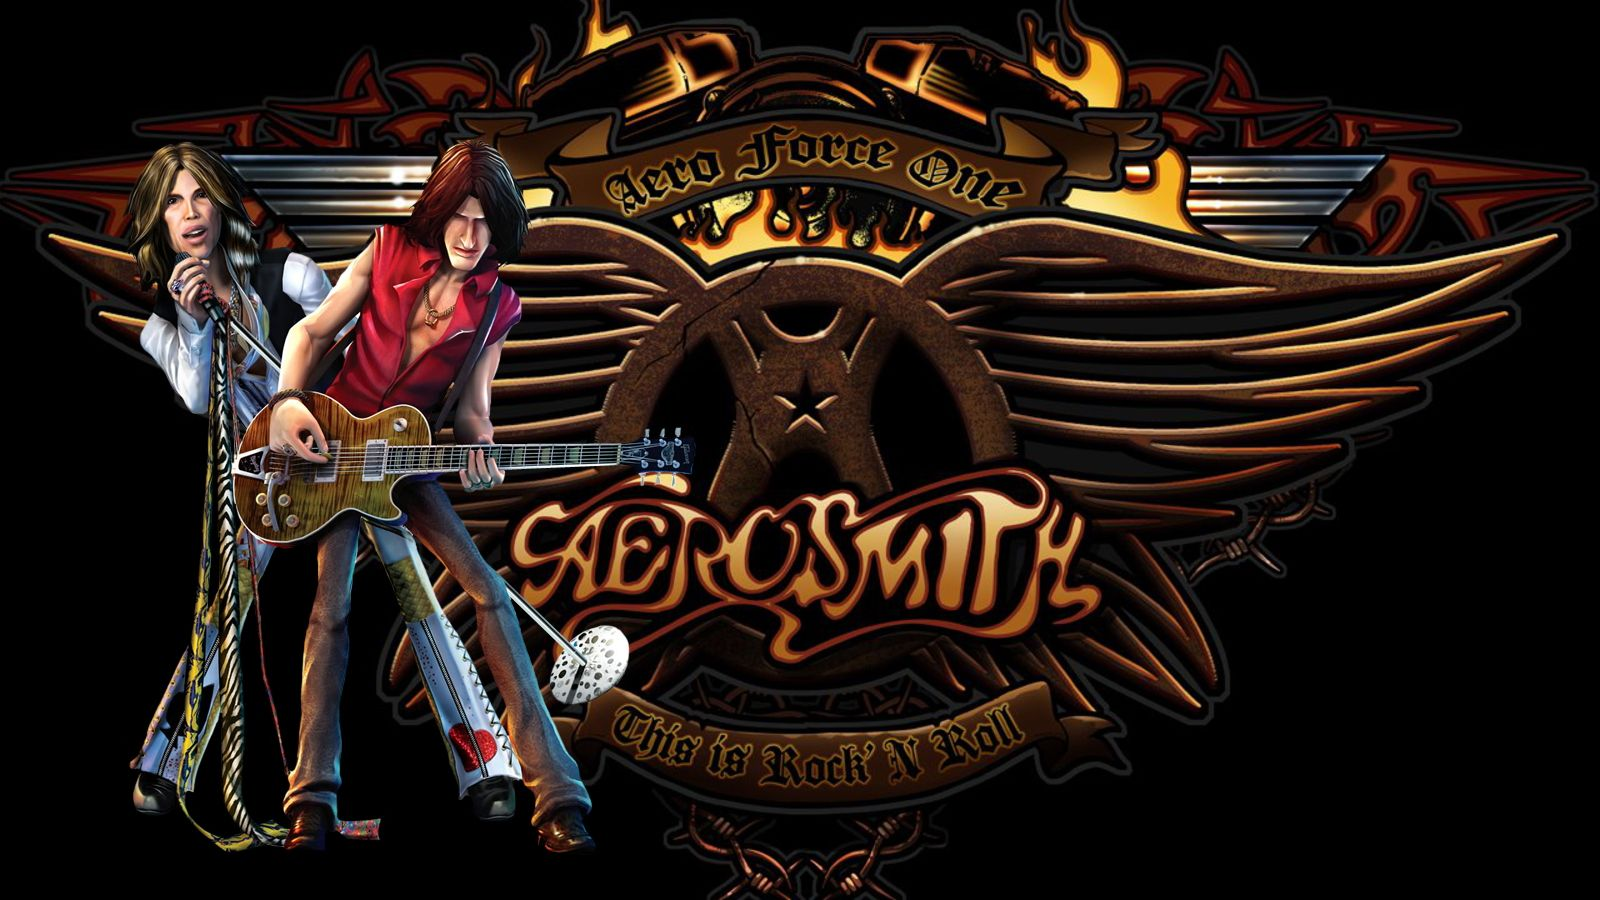 Aerosmith Logo Wallpaper Aerosmith Aerosmith Music Tyler Aerosmith